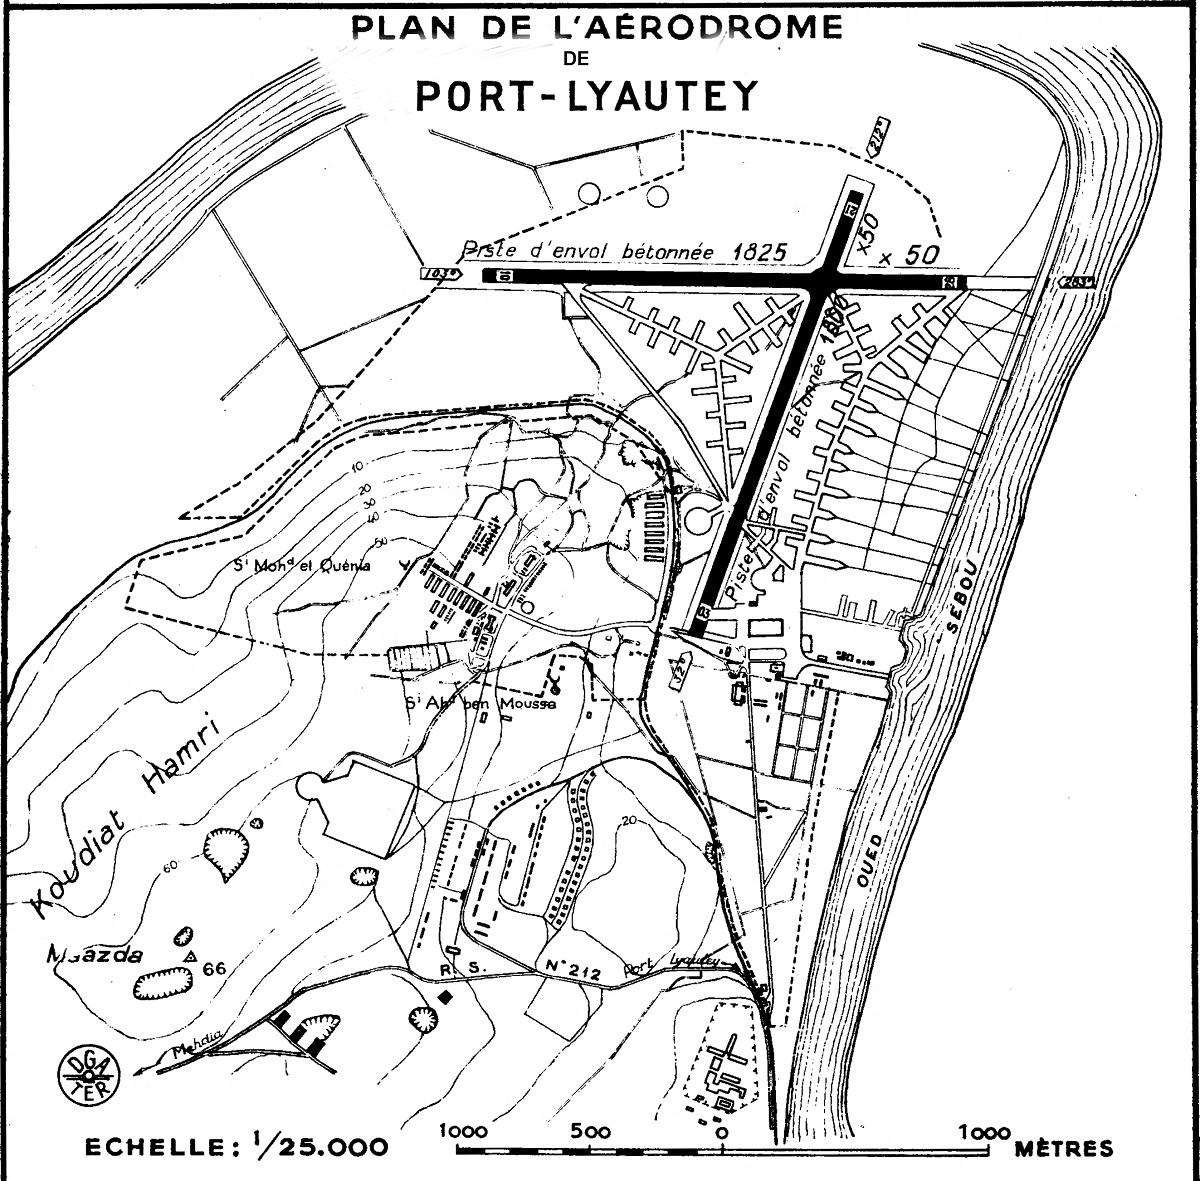 [LES B.A.N.] PORT LYAUTEY (MAROC) - Page 5 Carte_14